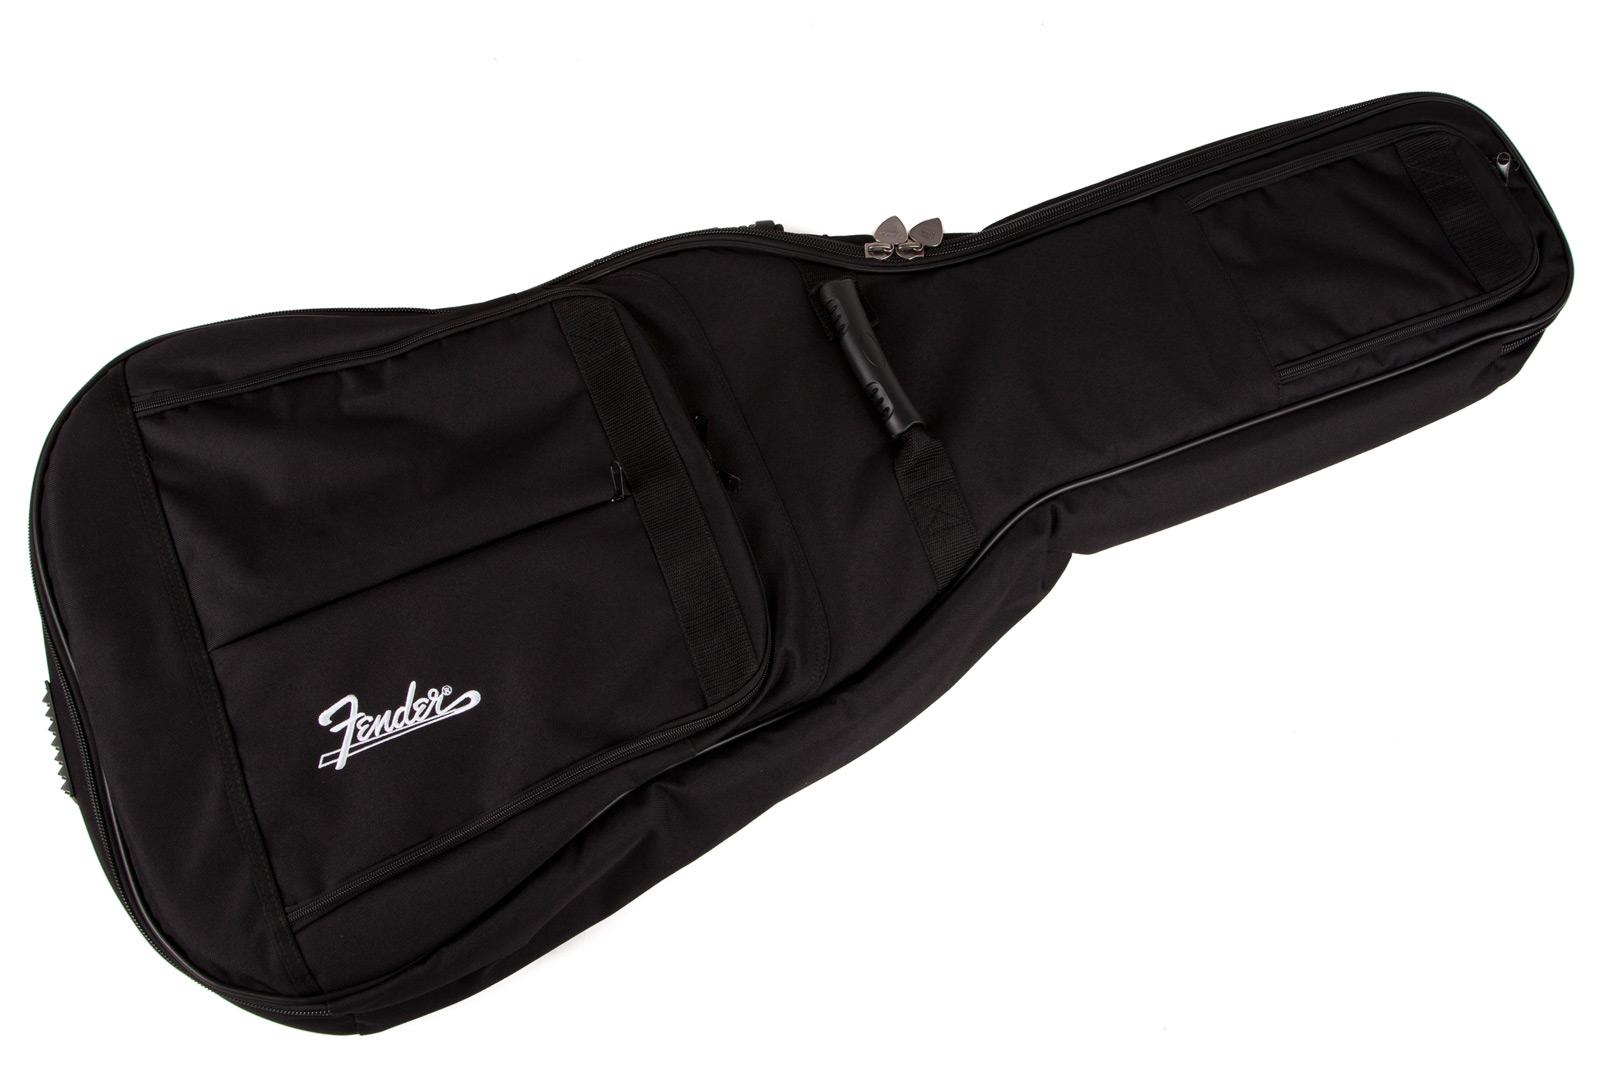 Fender 099 1612 206 housse serie metro pour guitare demi for Housse guitare